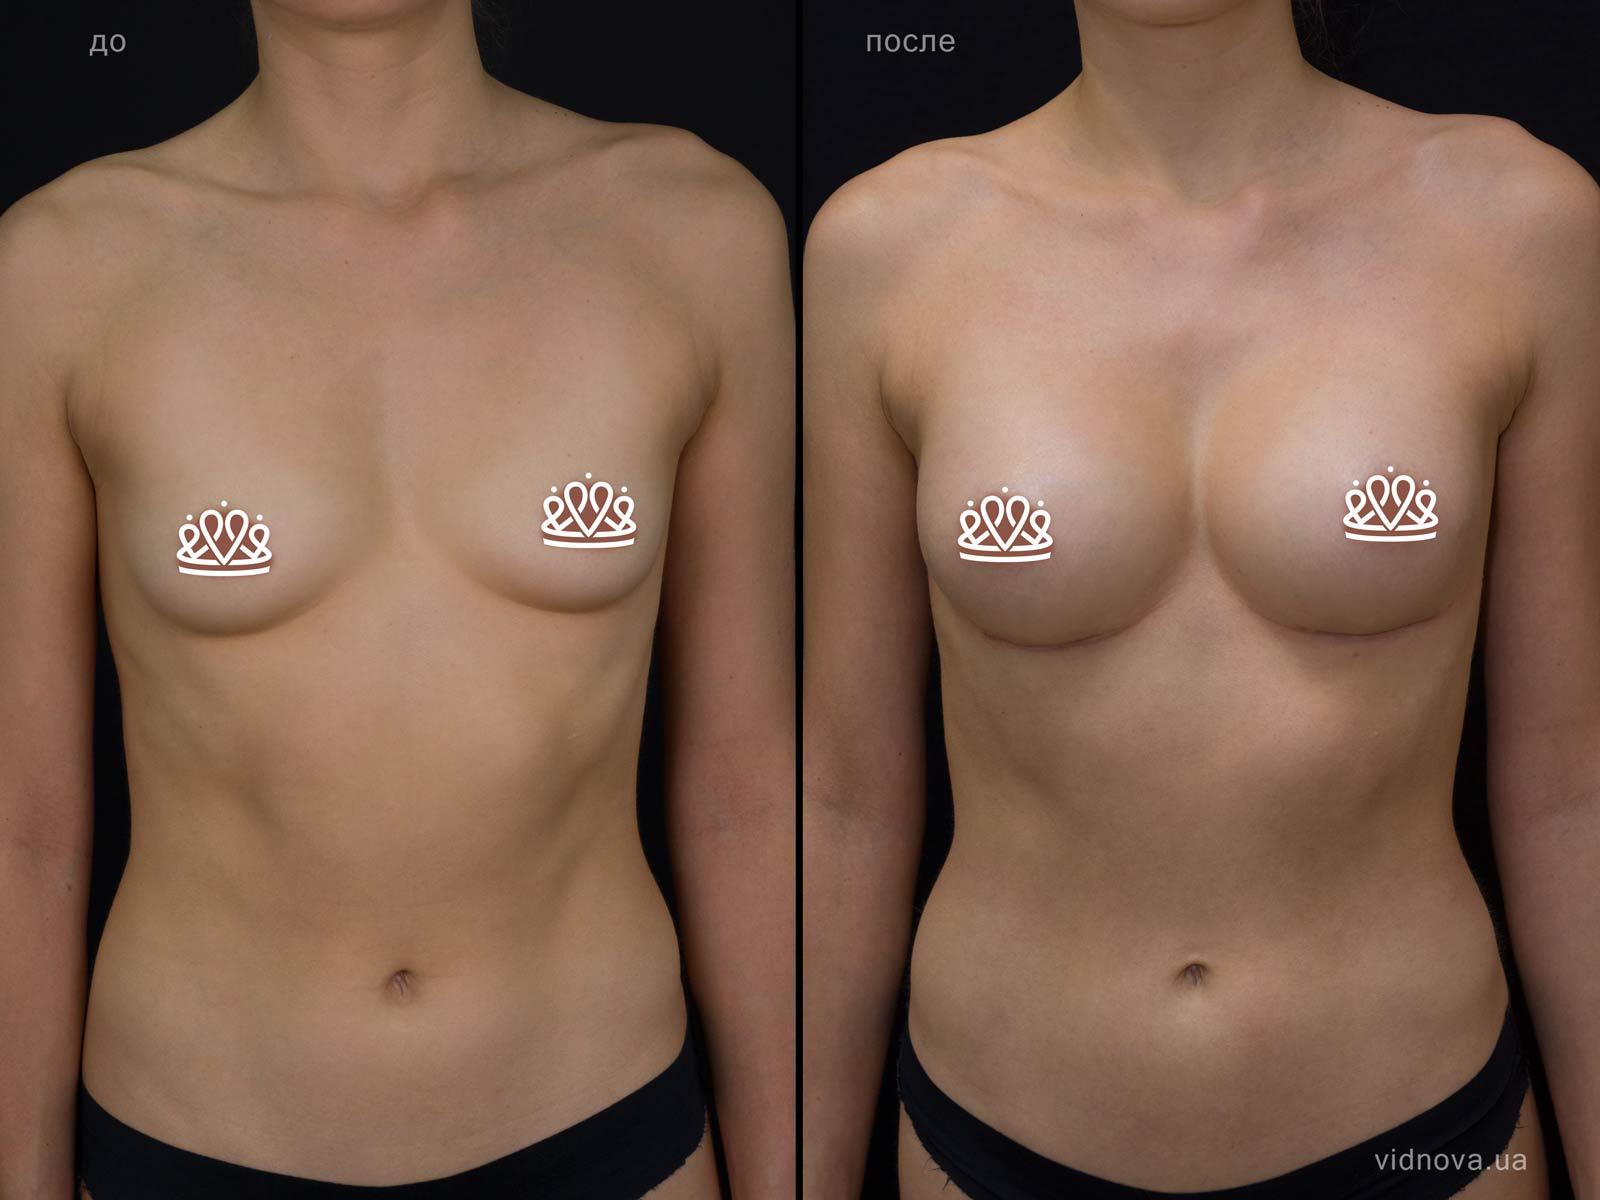 Увеличение груди 1s 20